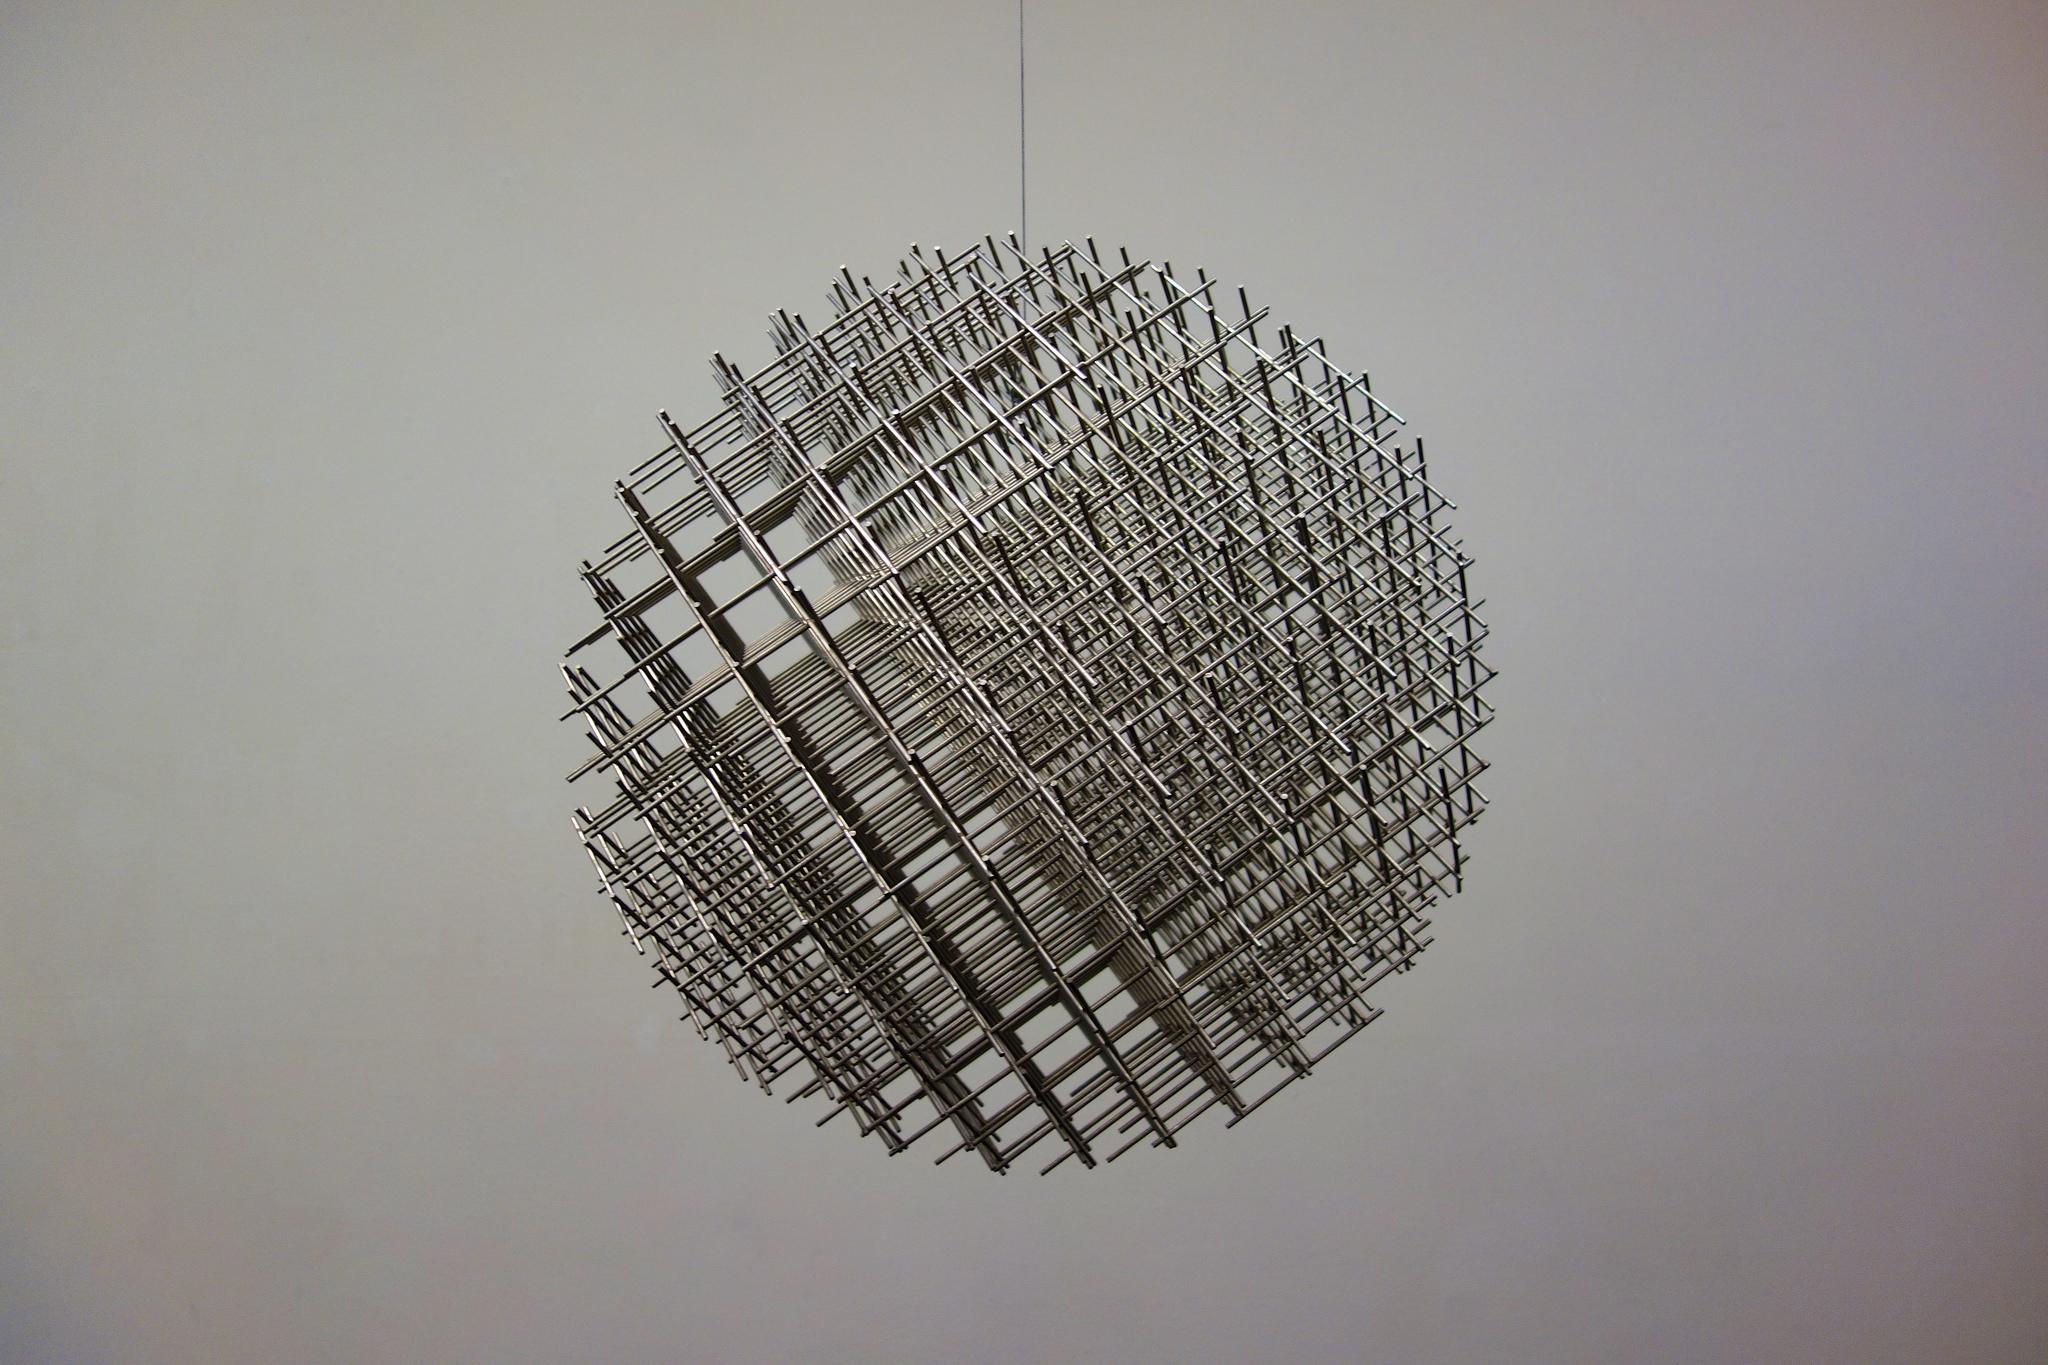 Sphère-trame by François Morellet